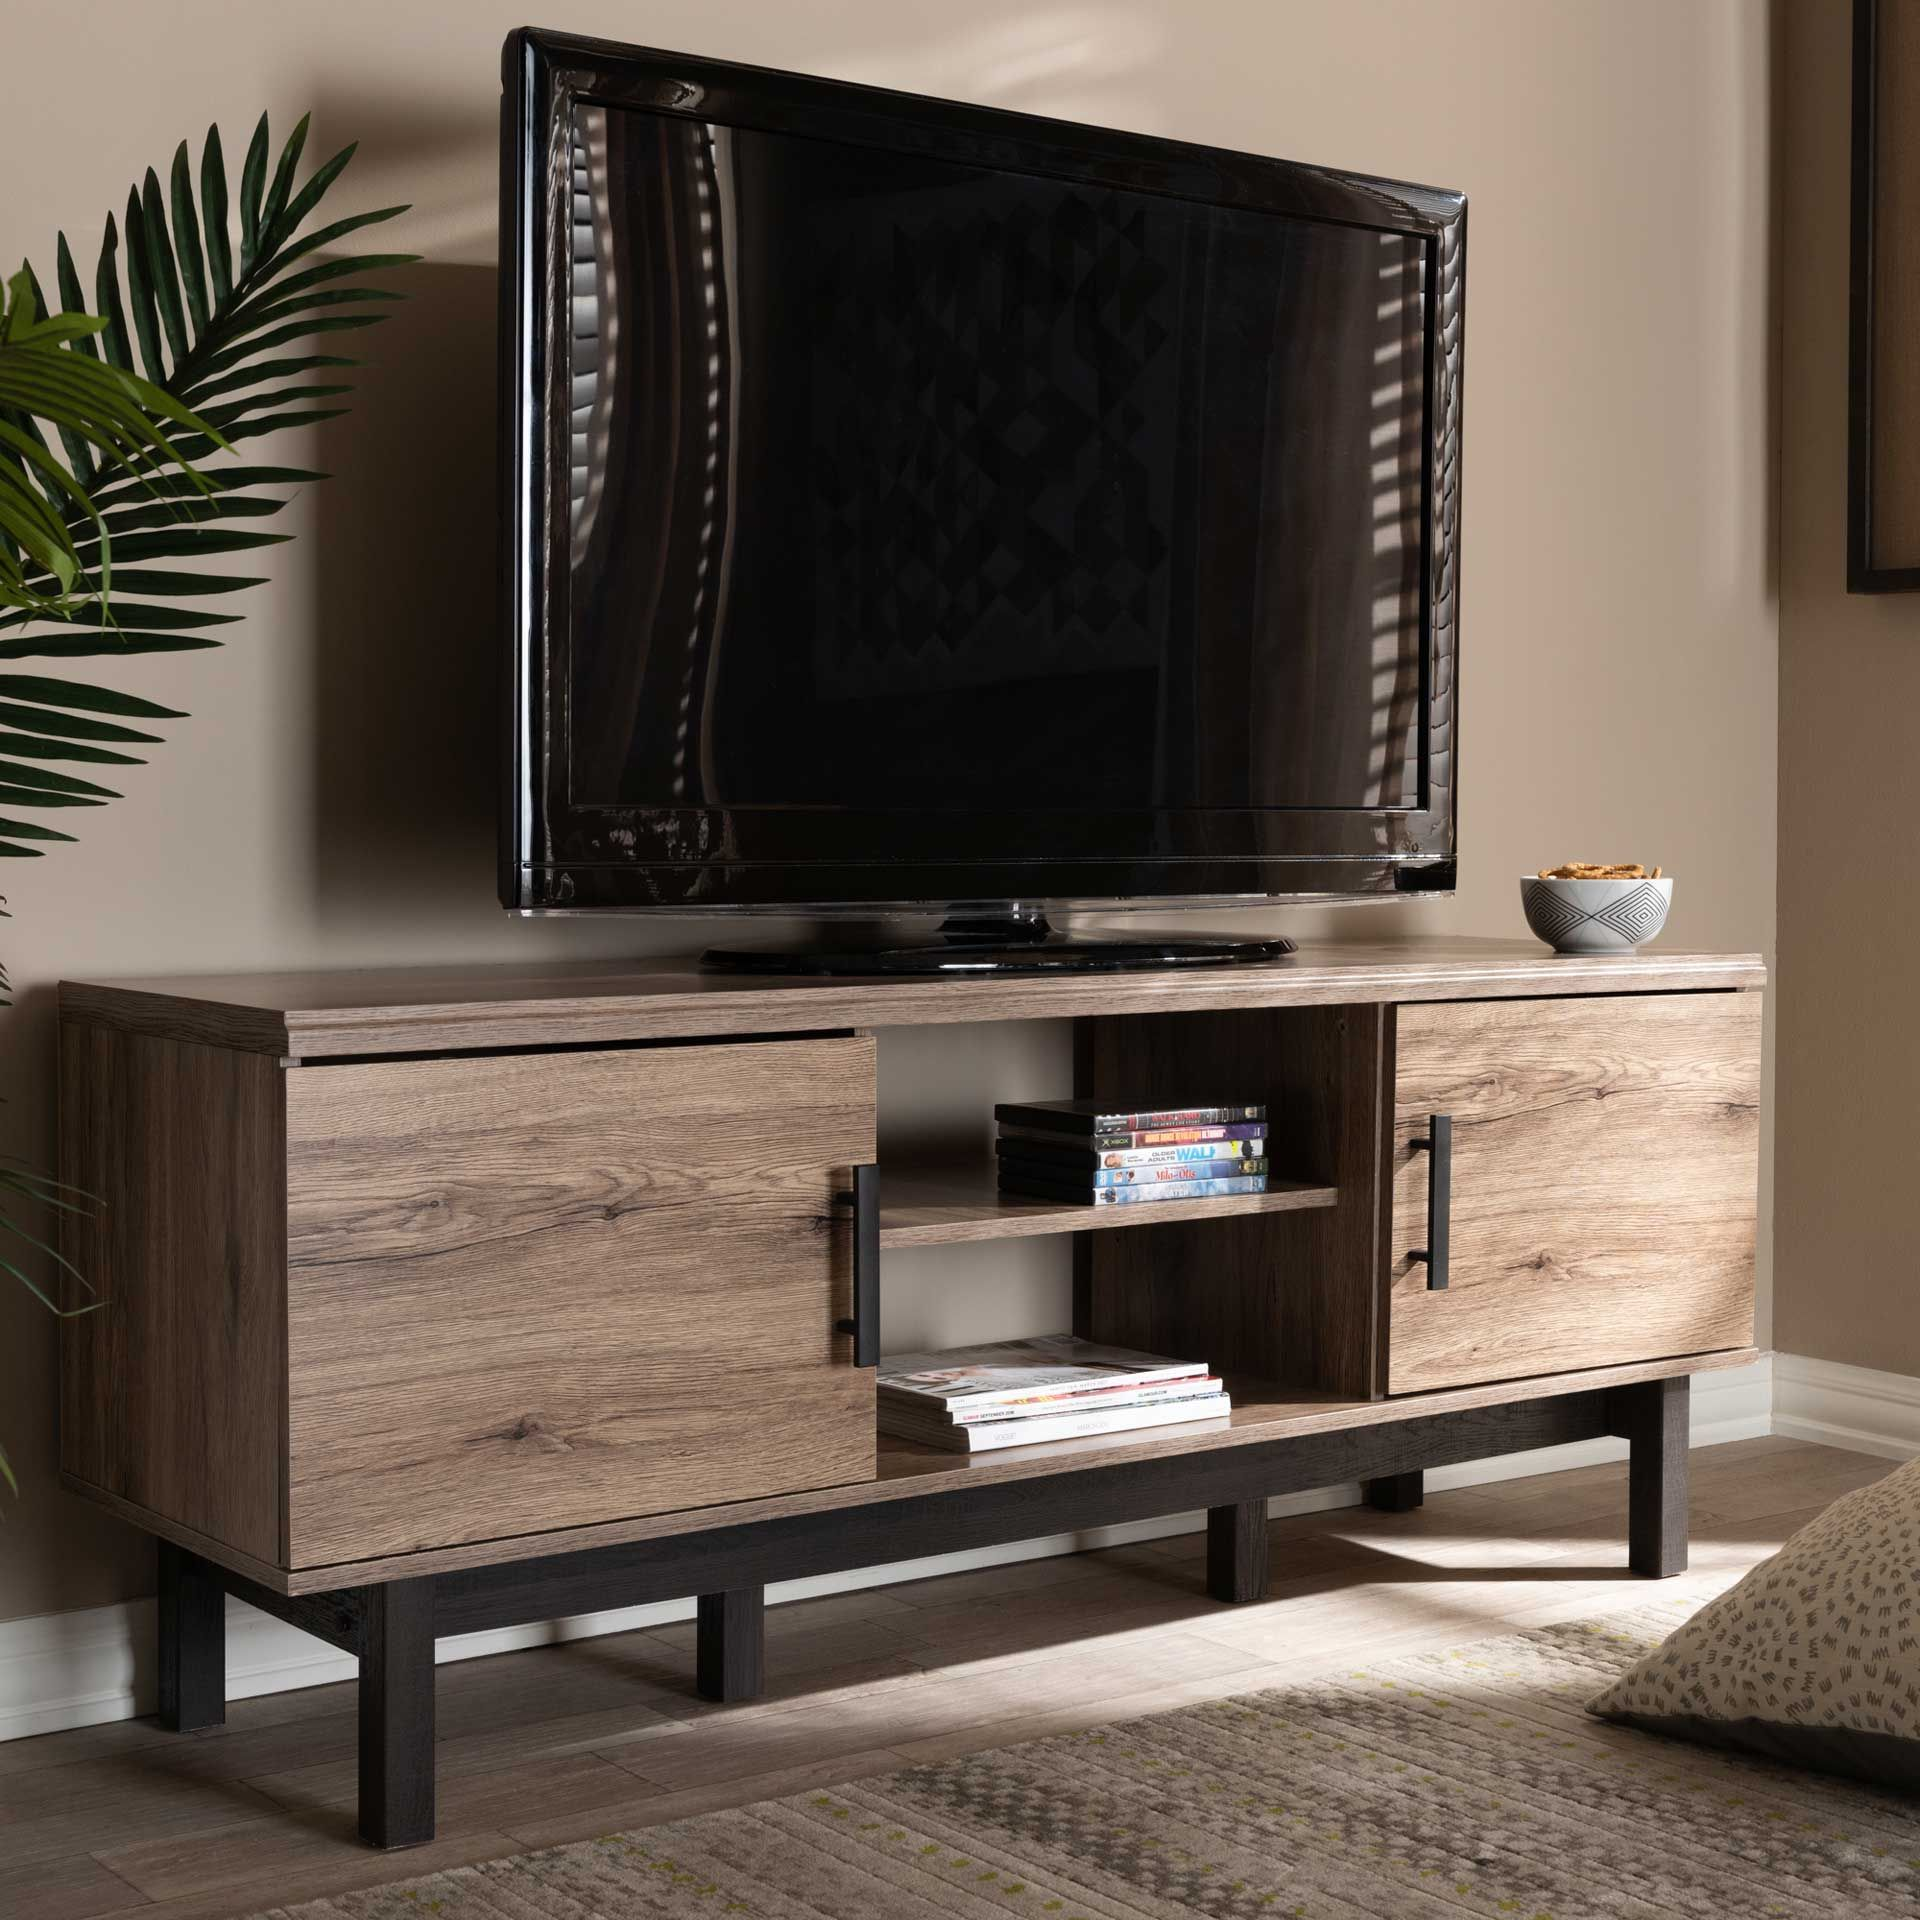 Ariel 2 Door Tv Stand Oak Black In 2021 Tv Stand Wood Tv Stand Brown Contemporary Tv Stands